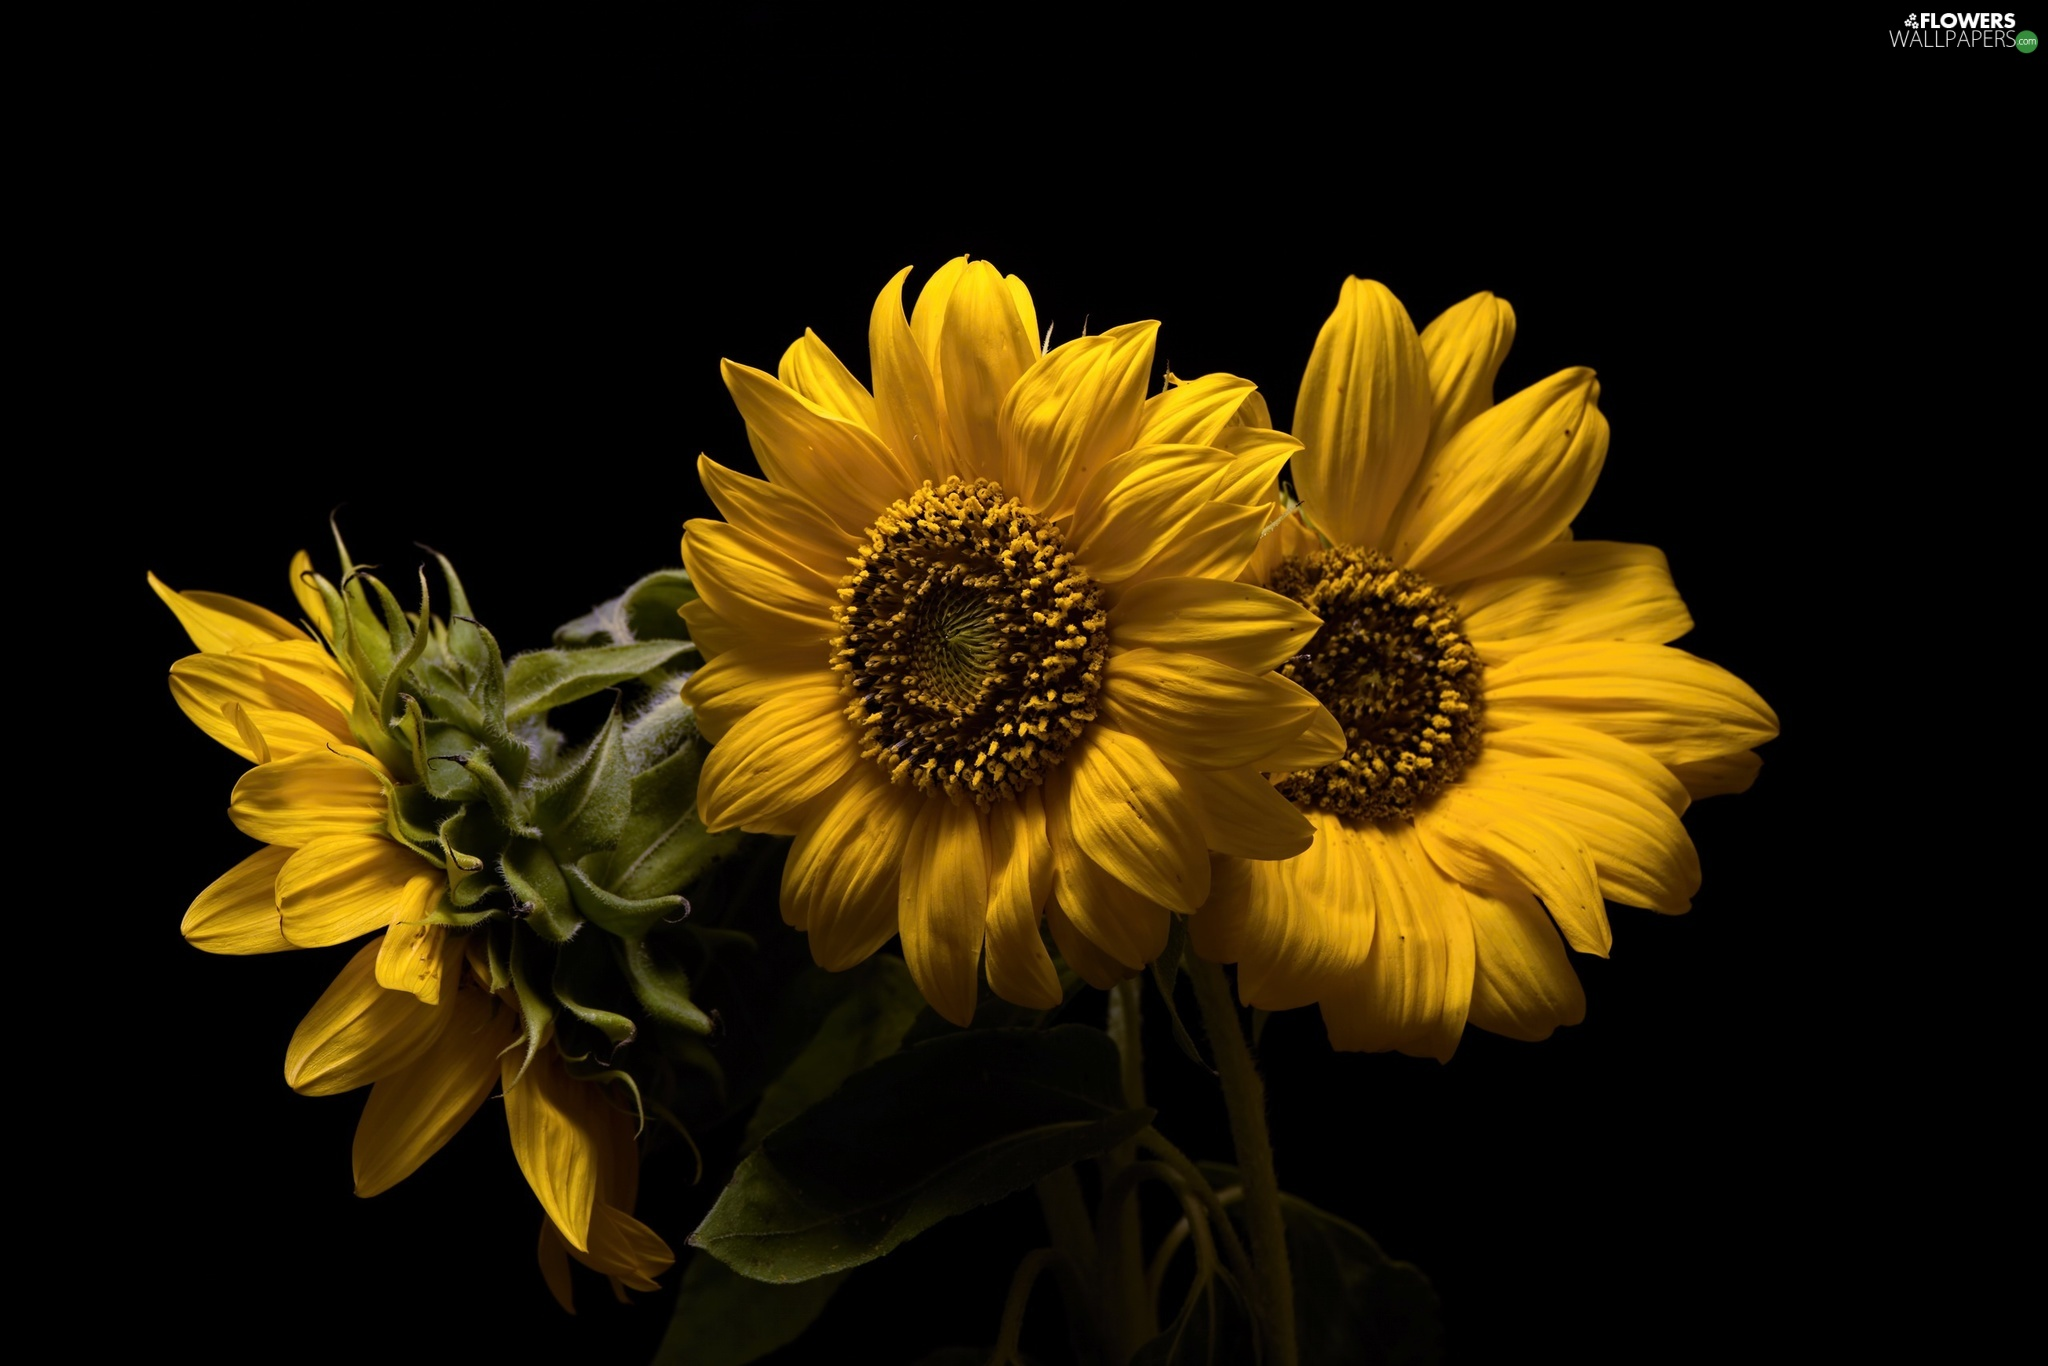 Three, Black, background, decorative Sunflowers - Flowers ...